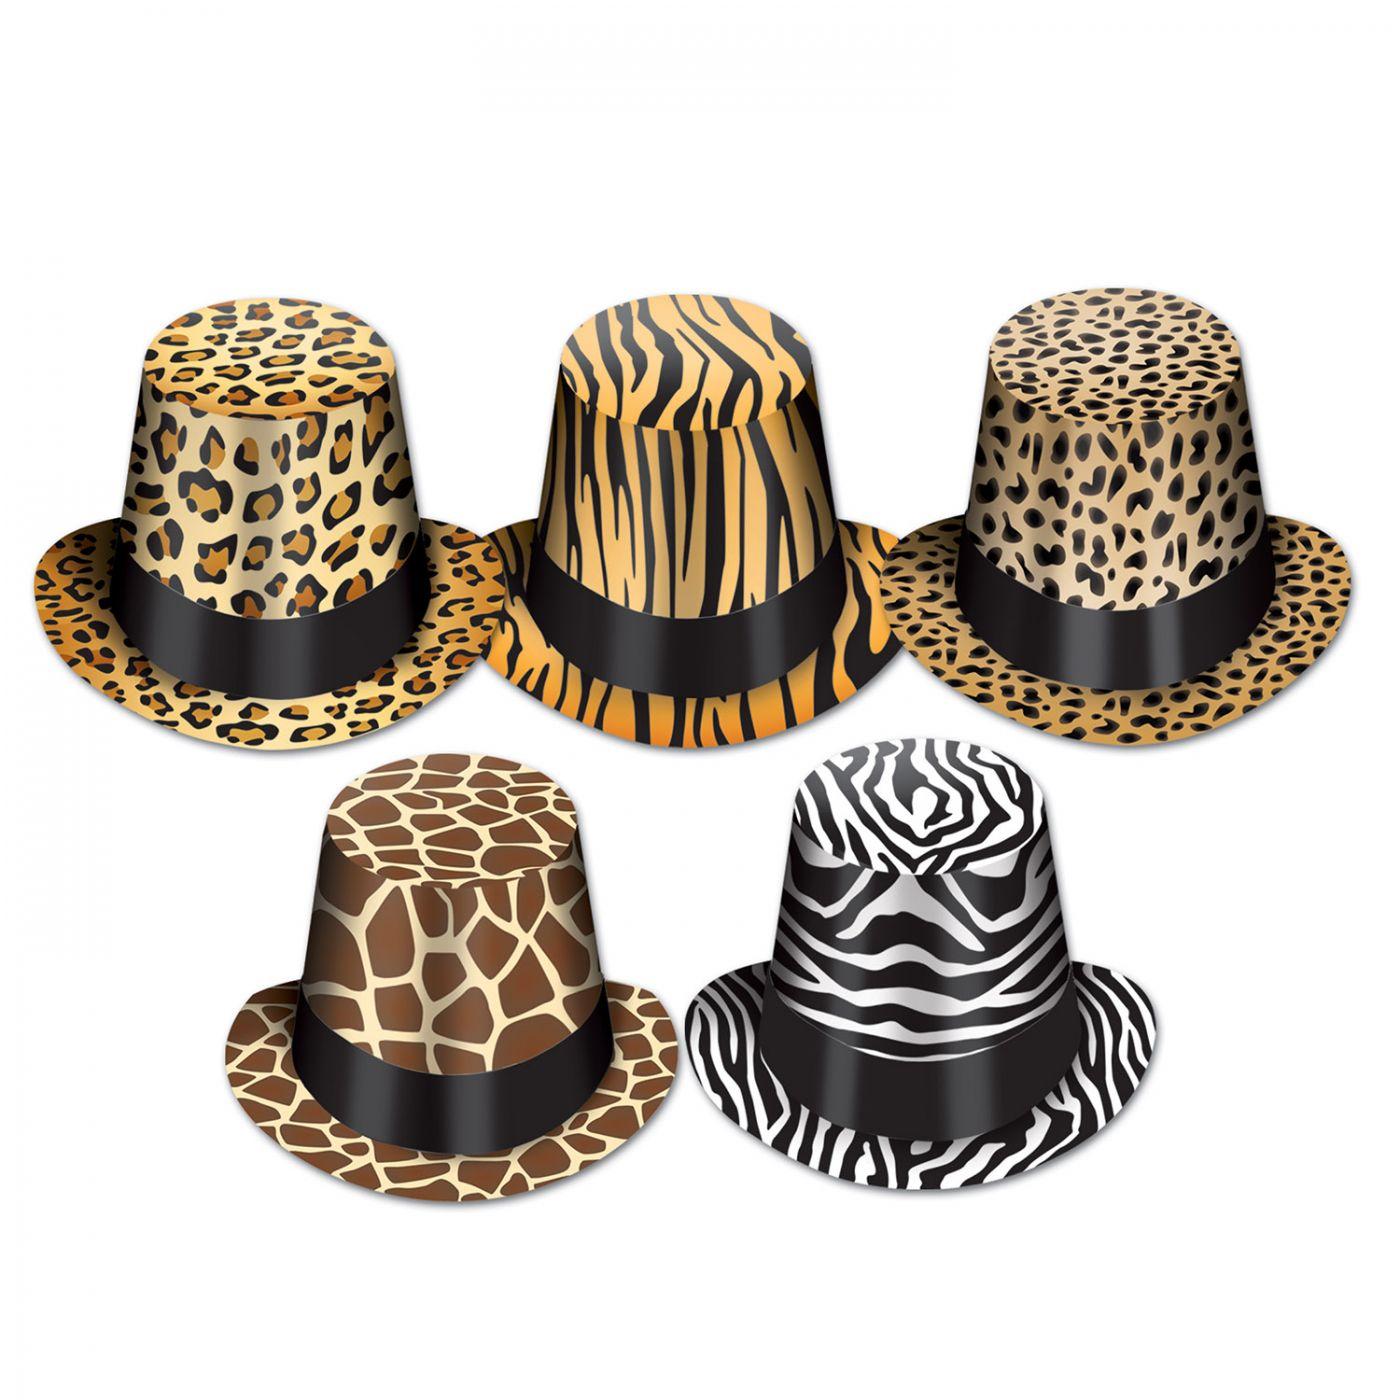 Image of Animal Print Hi-Hats (25)